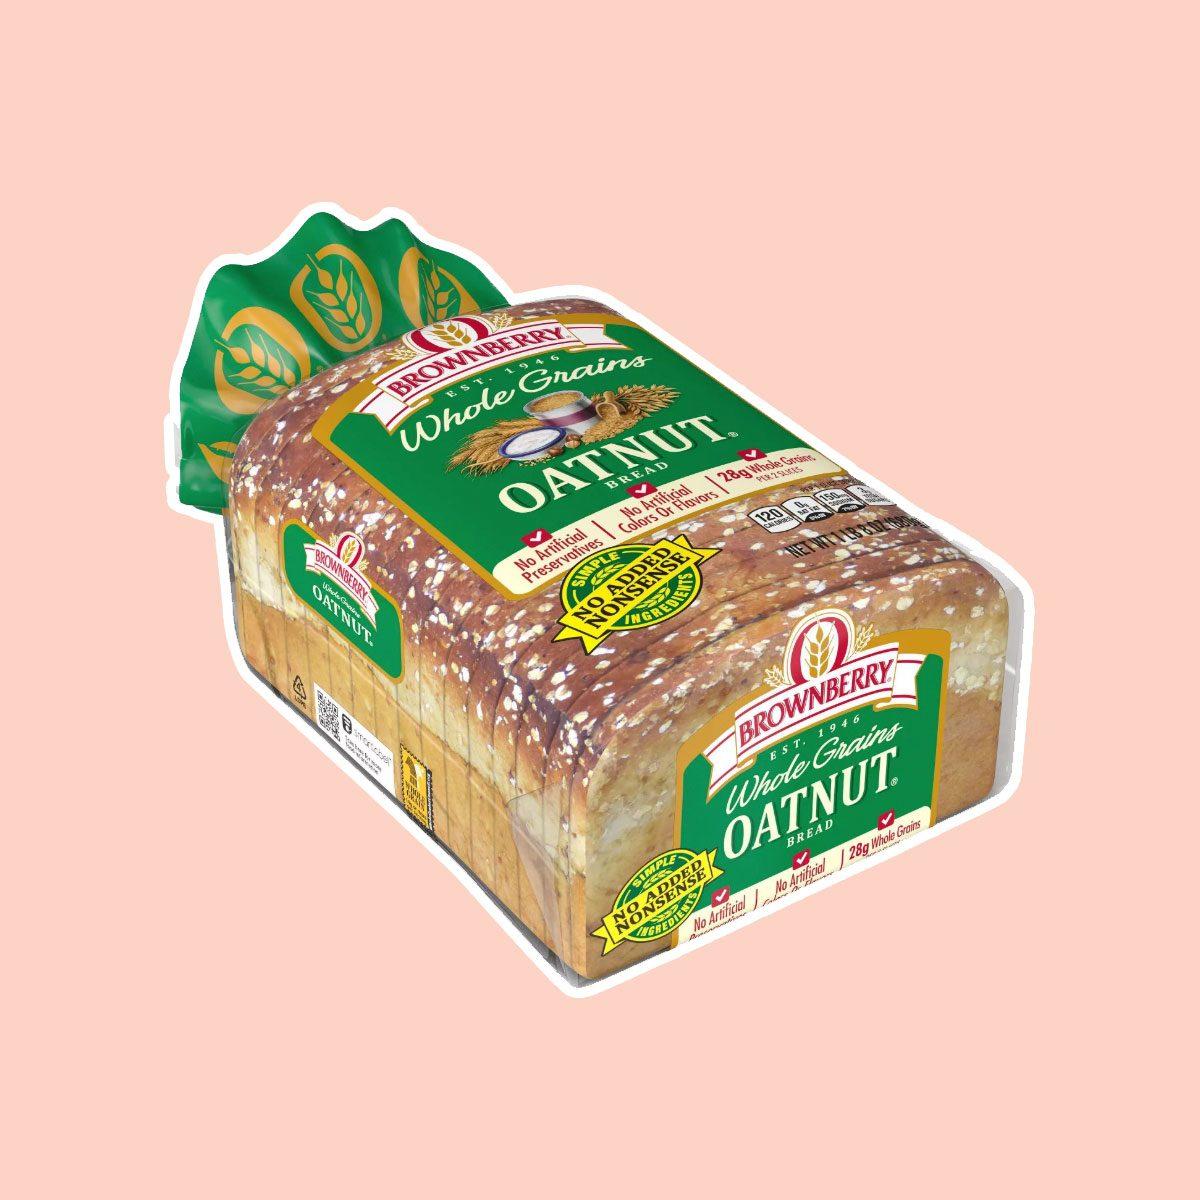 Arnold Oatnut Bread